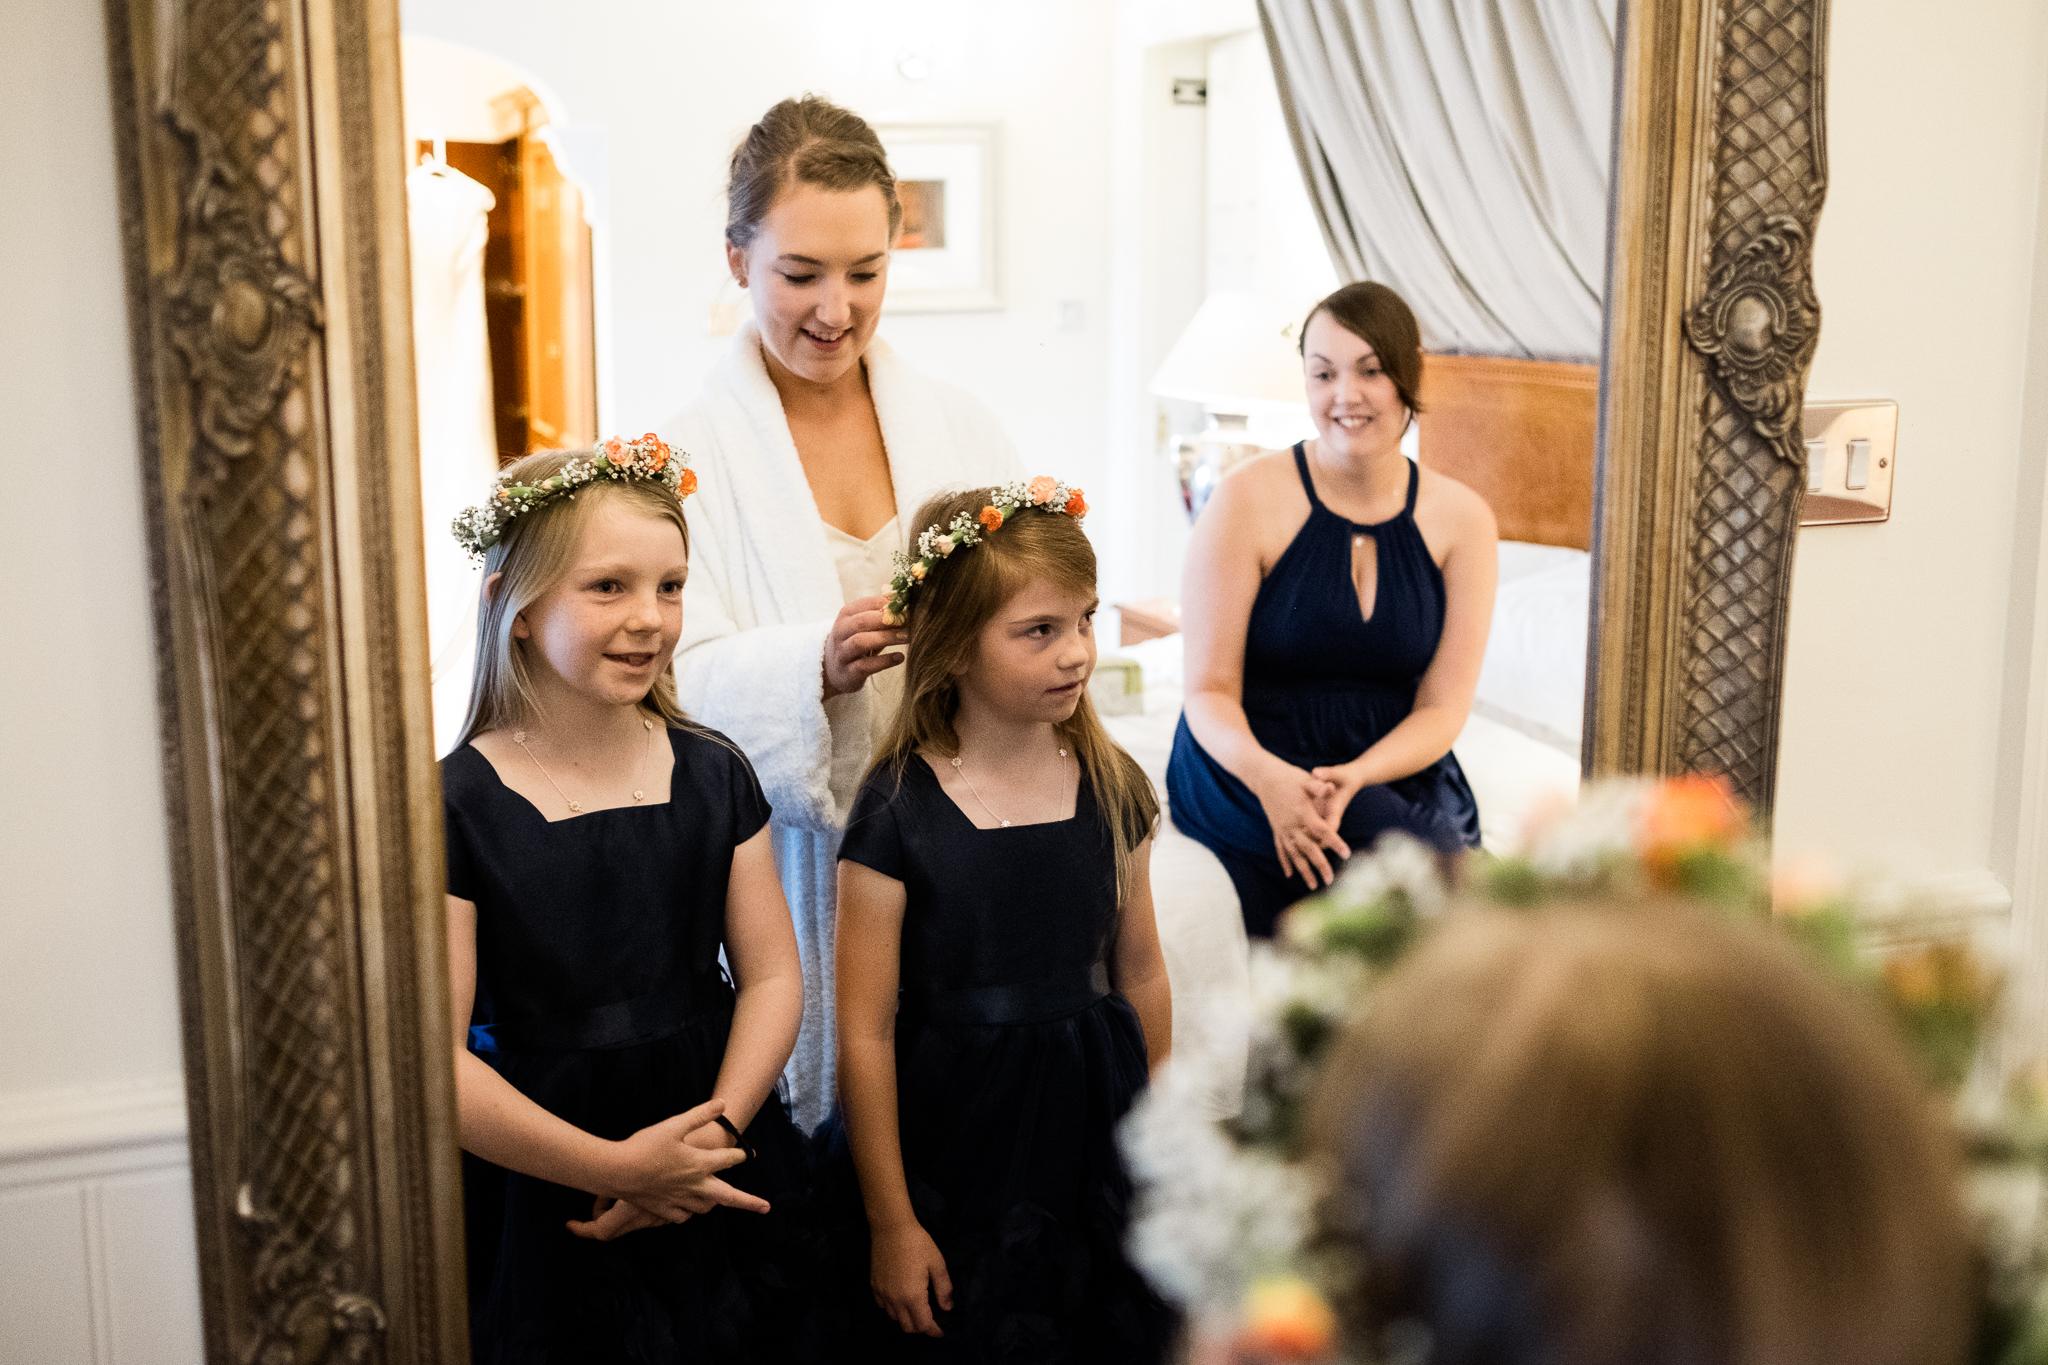 Relaxed Documentary Wedding Photography at The Wizard Inn, Alderley Edge Cheshire - Jenny Harper-6.jpg